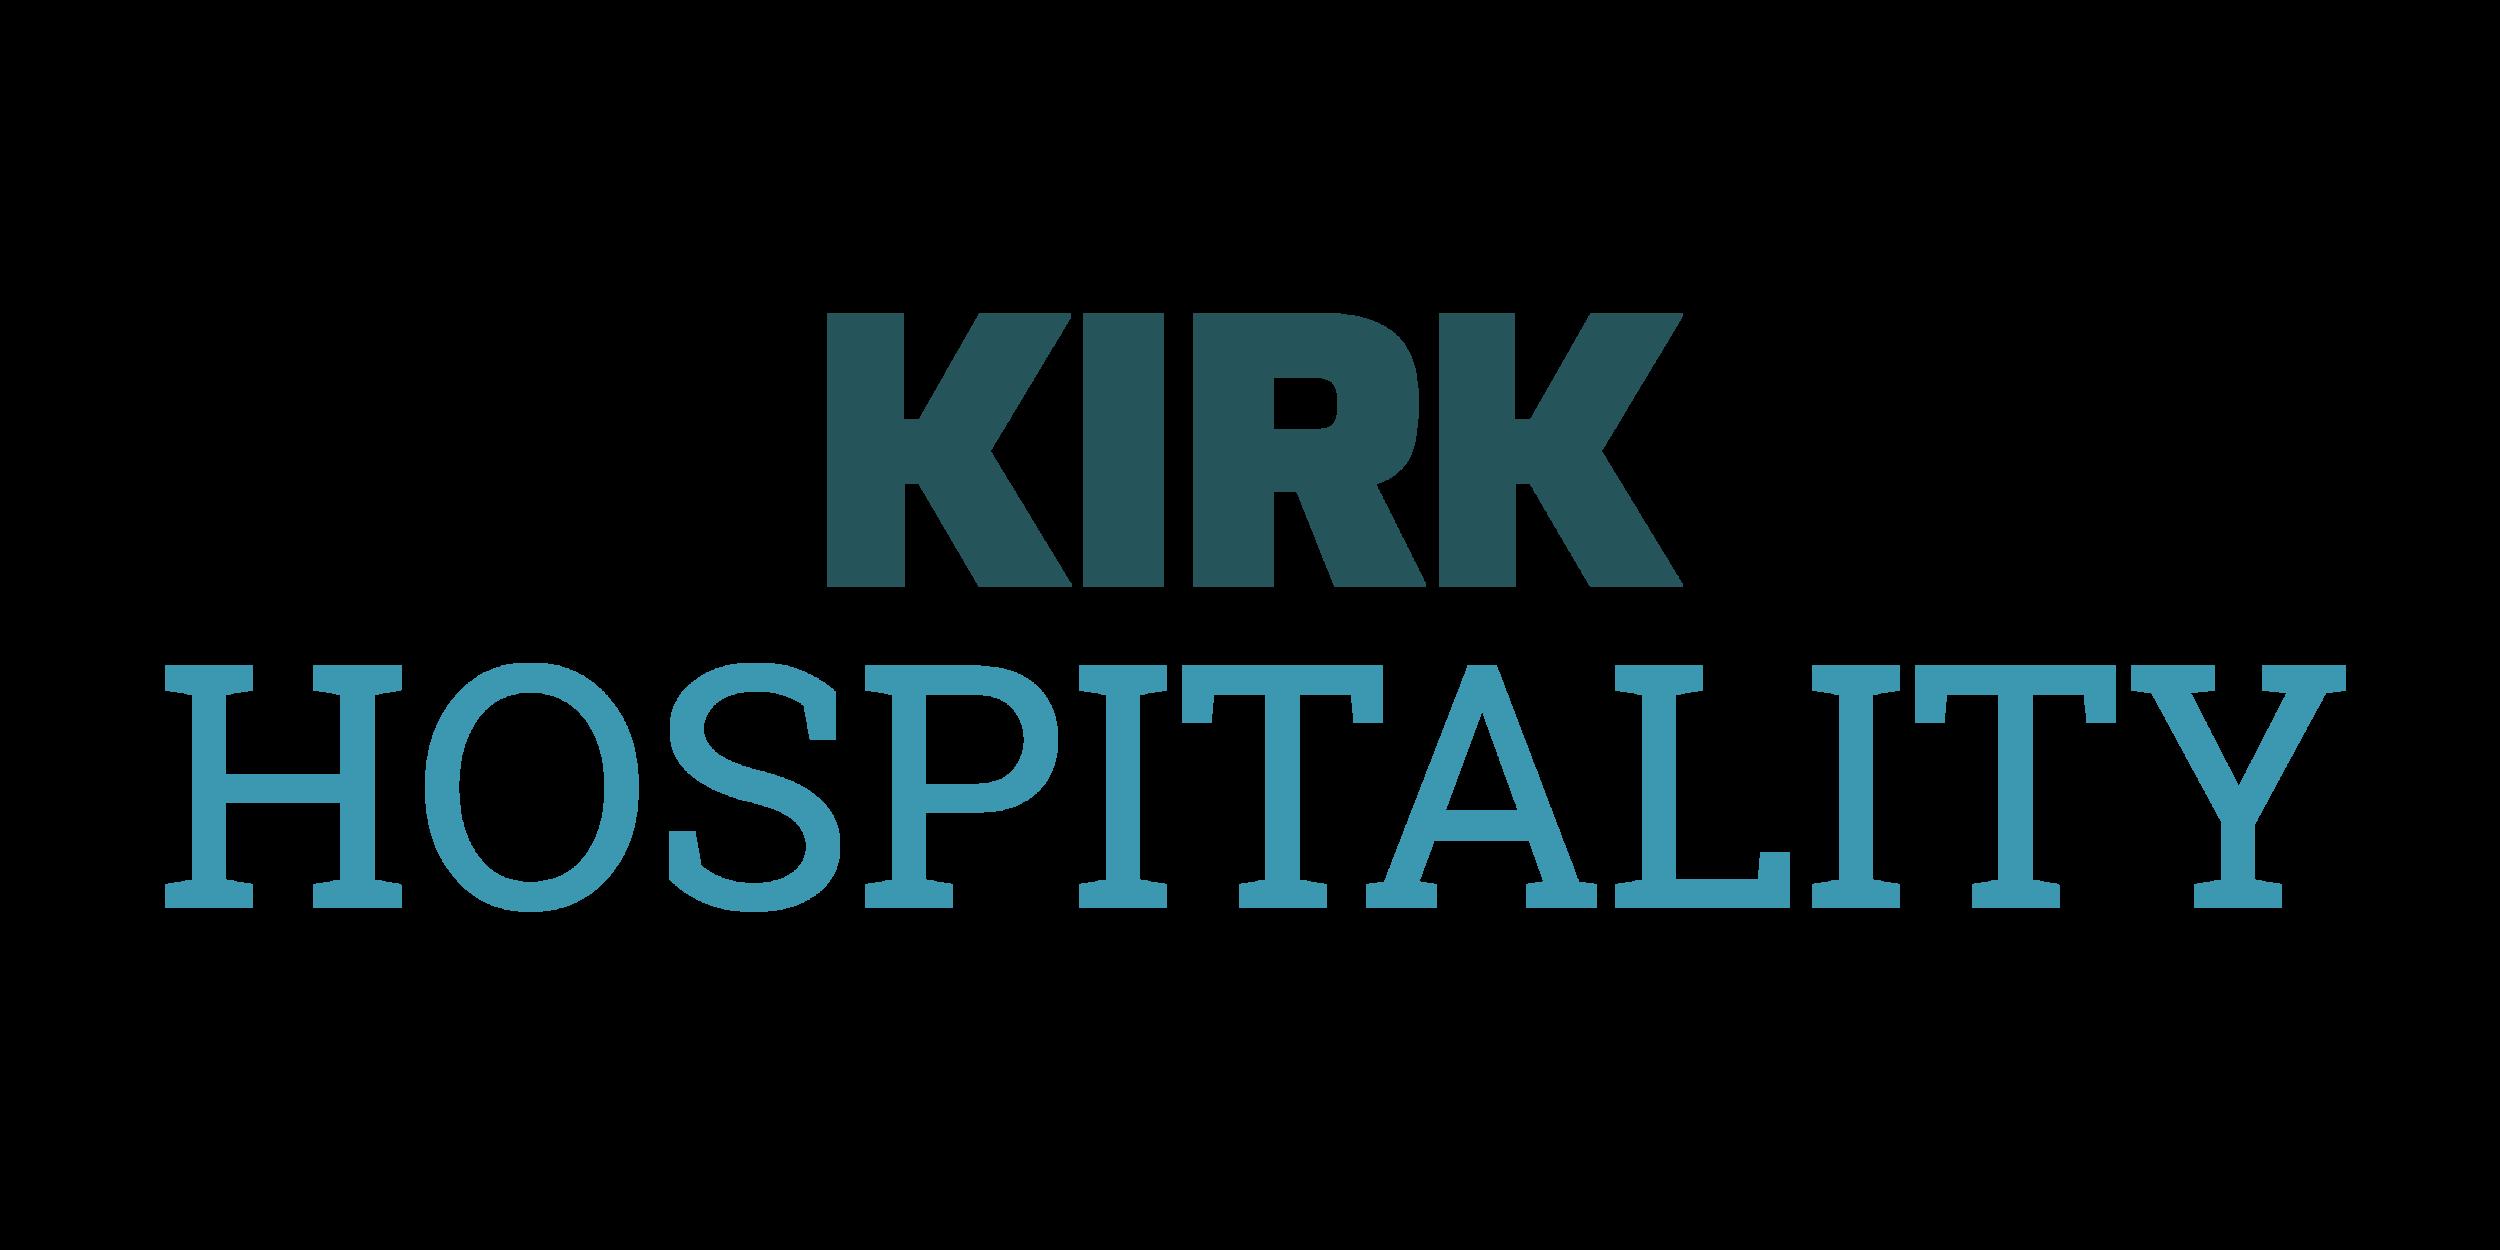 kirk_hospitality.png